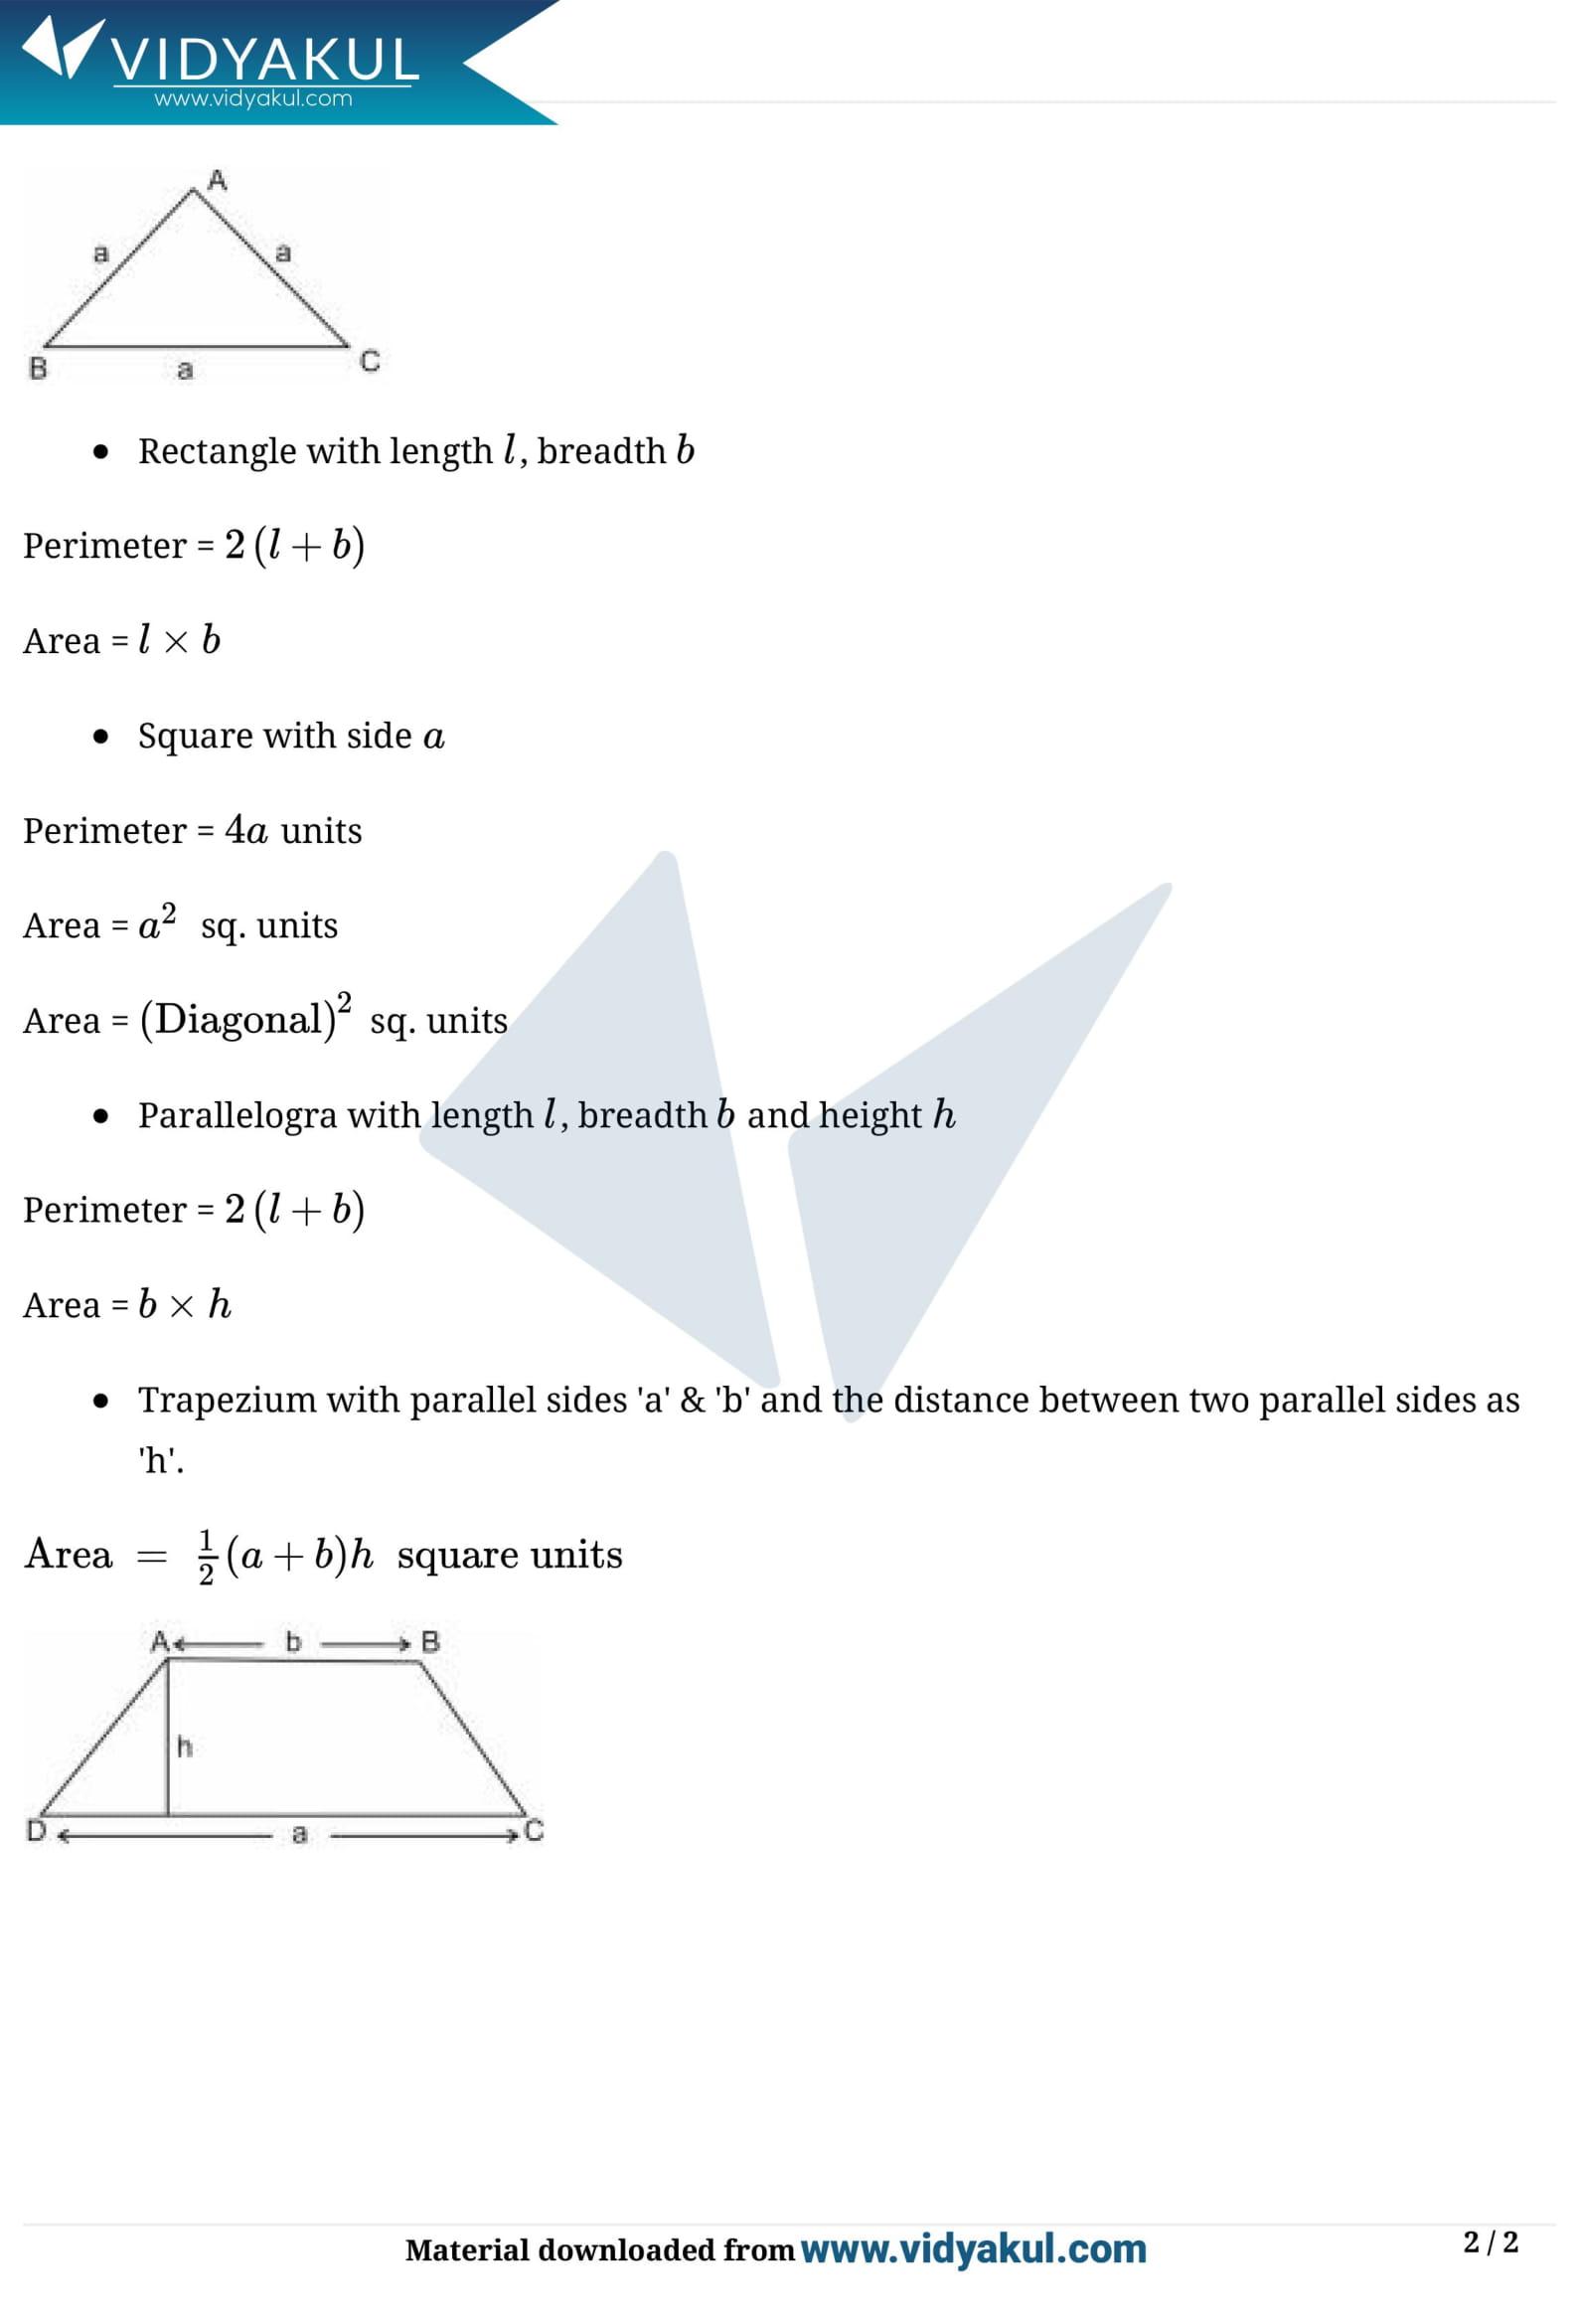 Heron's Formula Class 9 Notes | Vidyakul